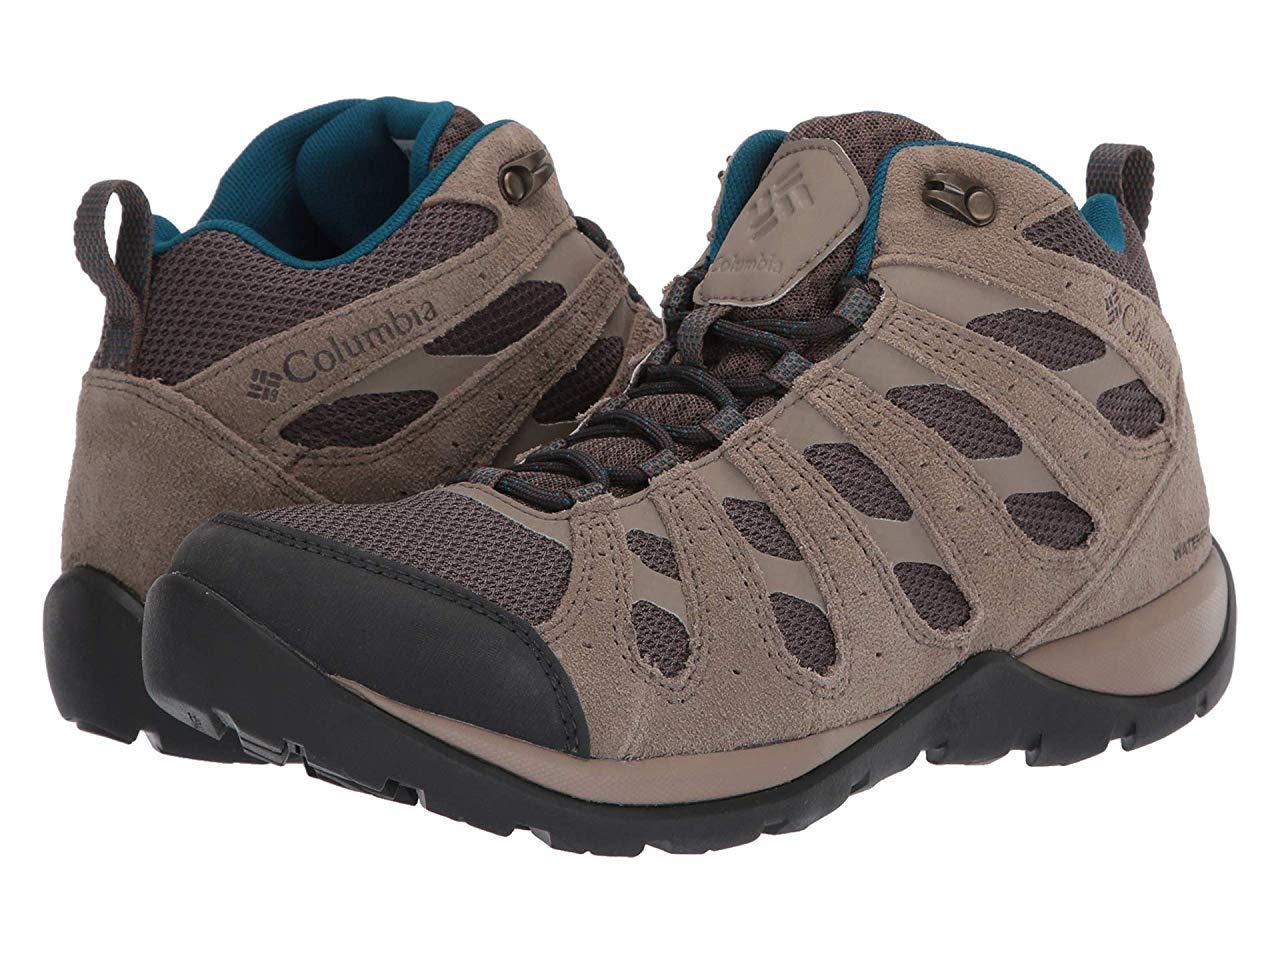 Ботинки/Сапоги Columbia Redmond™ V2 Mid Waterproof Mud/Lagoon